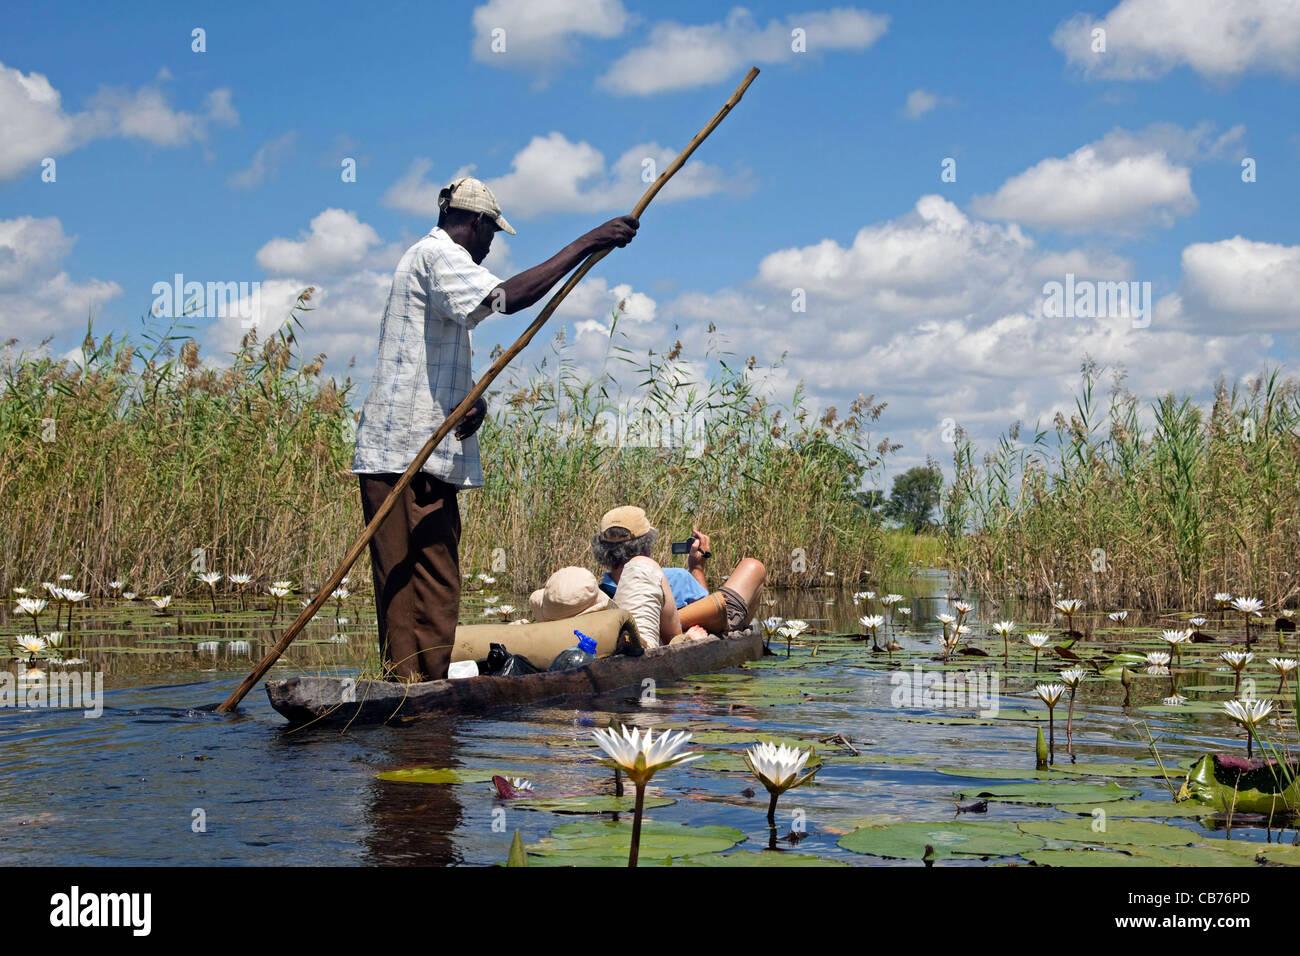 Tourists traveling in traditional wooden canoe, mokoro / makoro in the Okavango Delta, Botswana, Africa - Stock Image